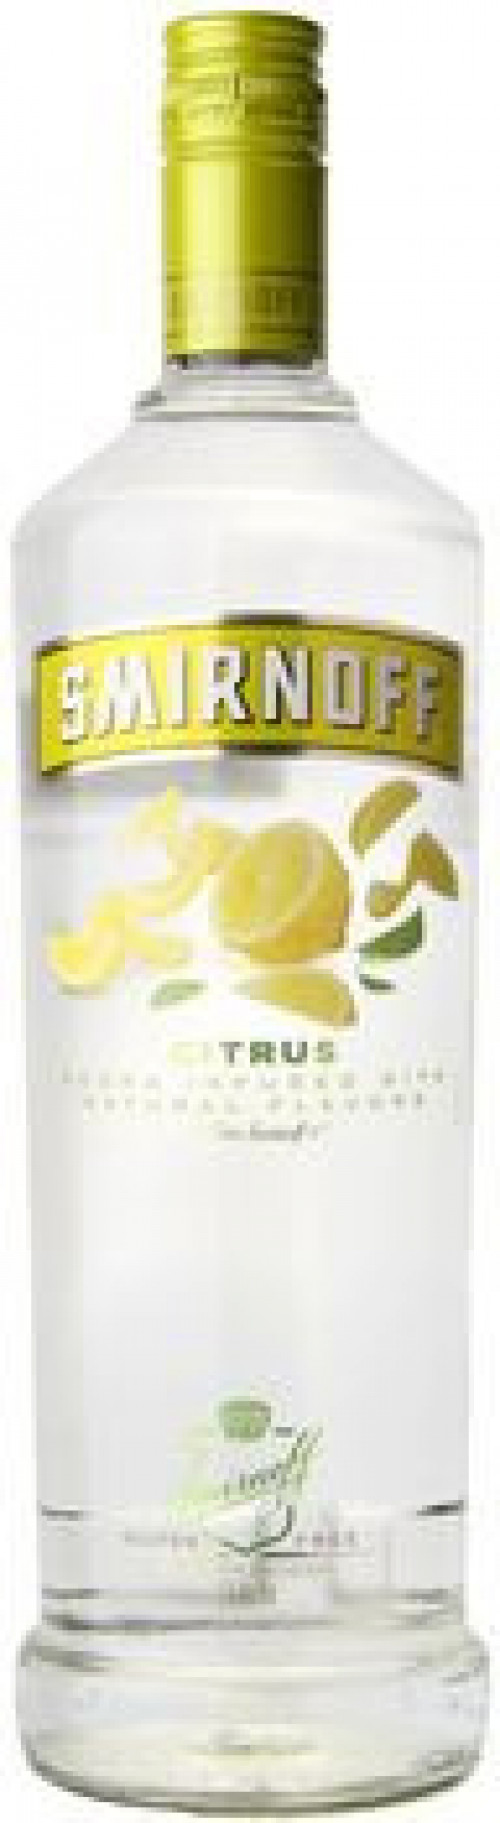 Smirnoff Citrus Flavored Vodka 750ml